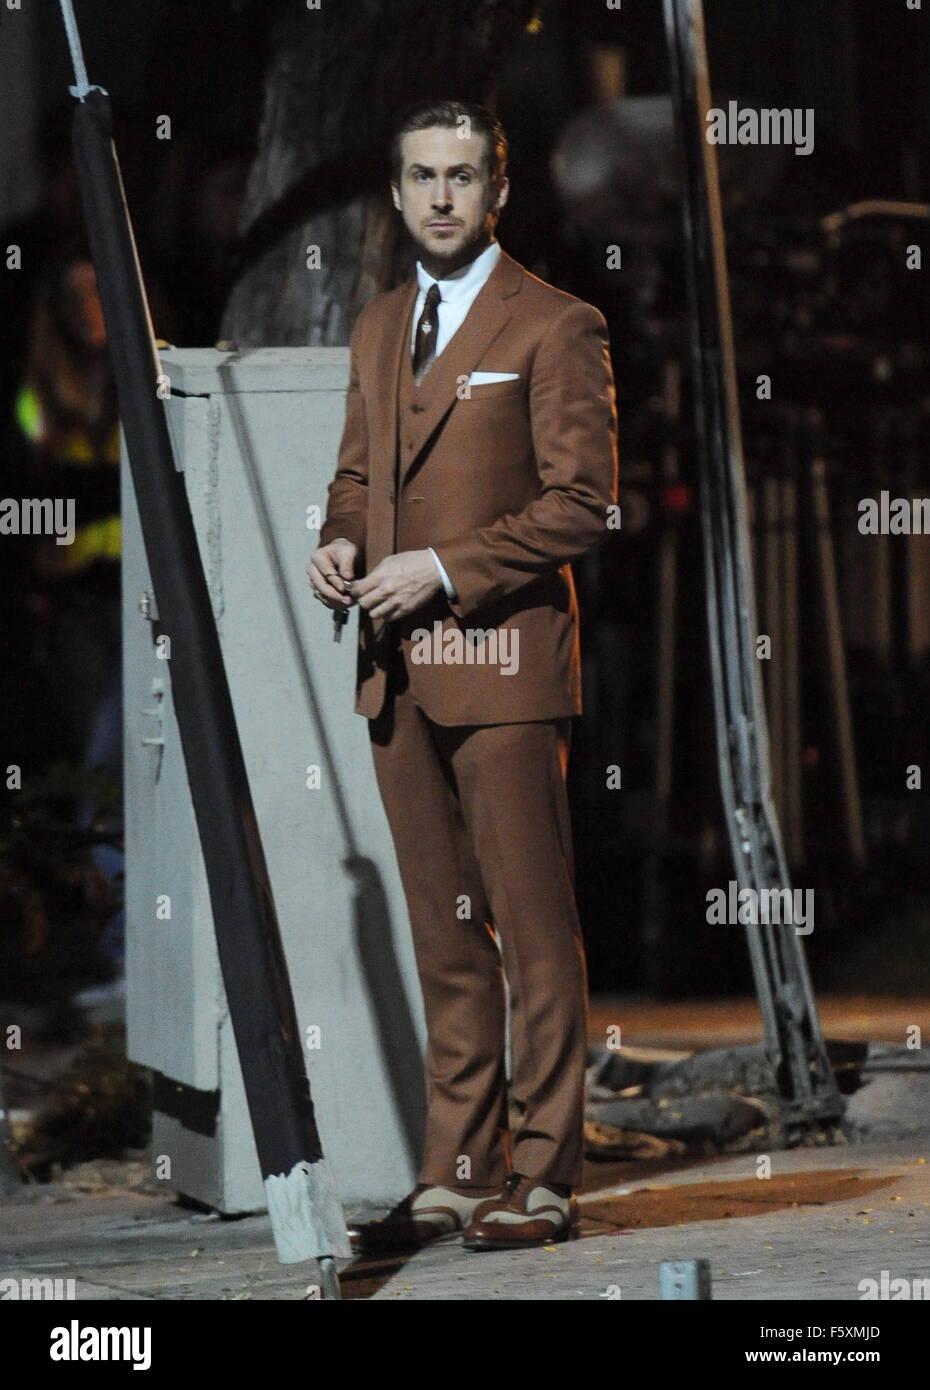 Ryan Gosling Sport Vintage Braunen Anzug Fur Eine Szene In La La